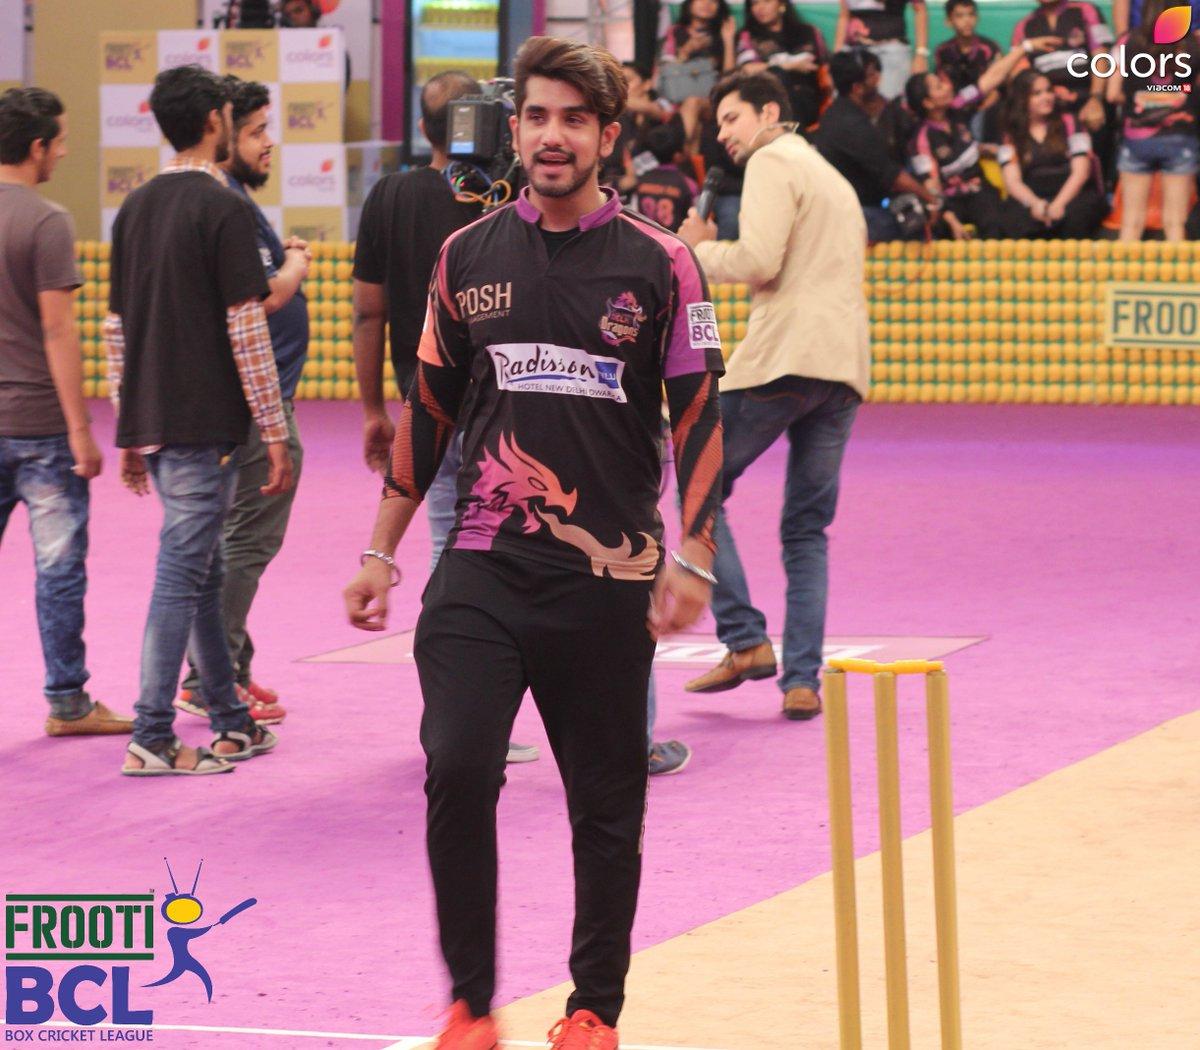 Suyyash Rai,Delhi Dragons,BCL 2,BCL2,Box Cricket league 2016, Box Cricket league season 2, image,pic,HD,picture